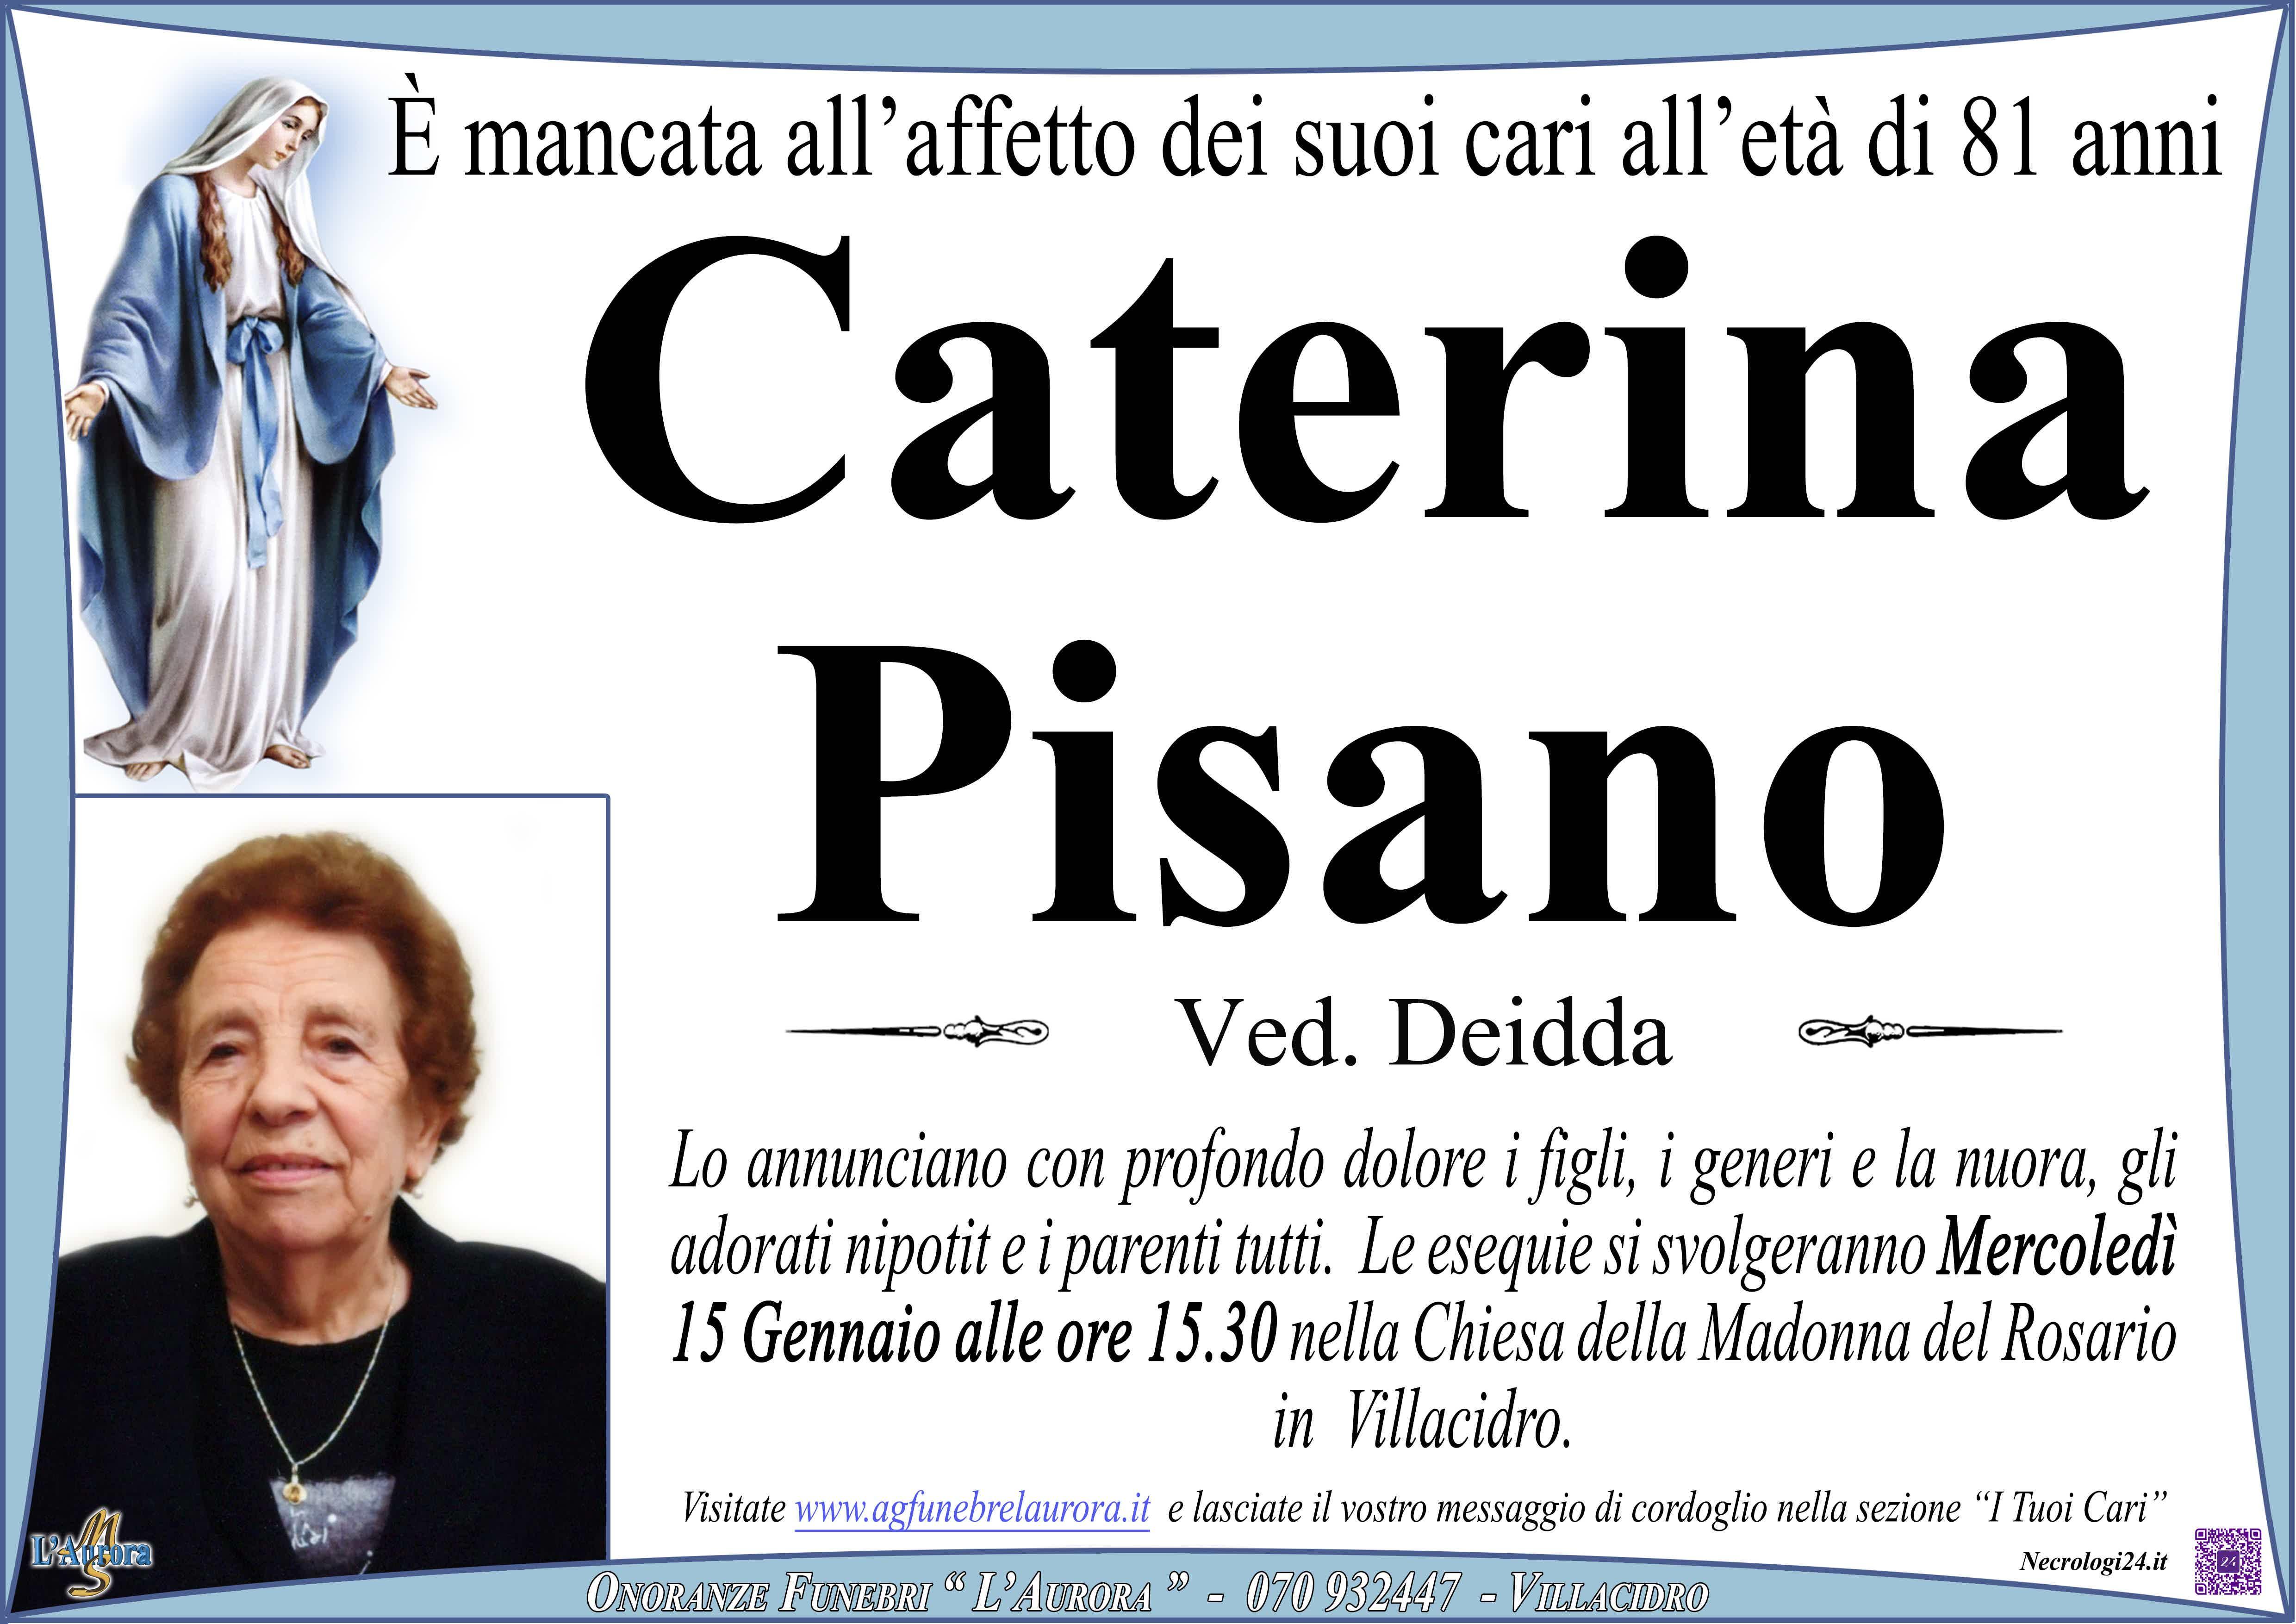 Caterina Pisano